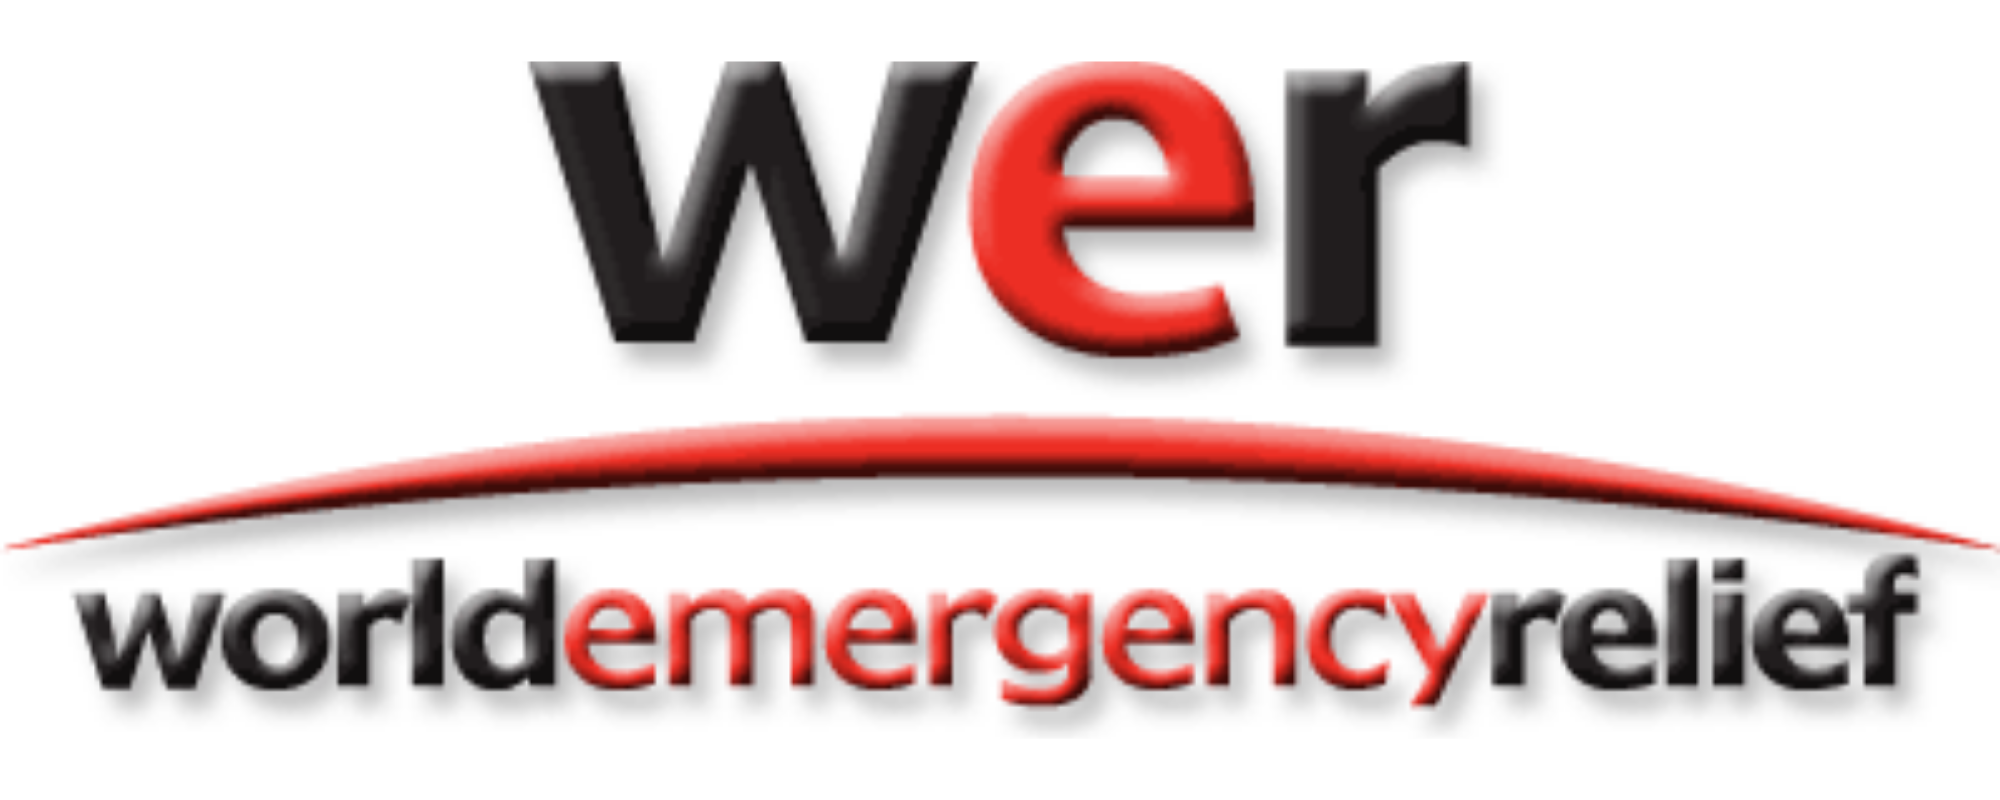 World Emergency Relief Resize